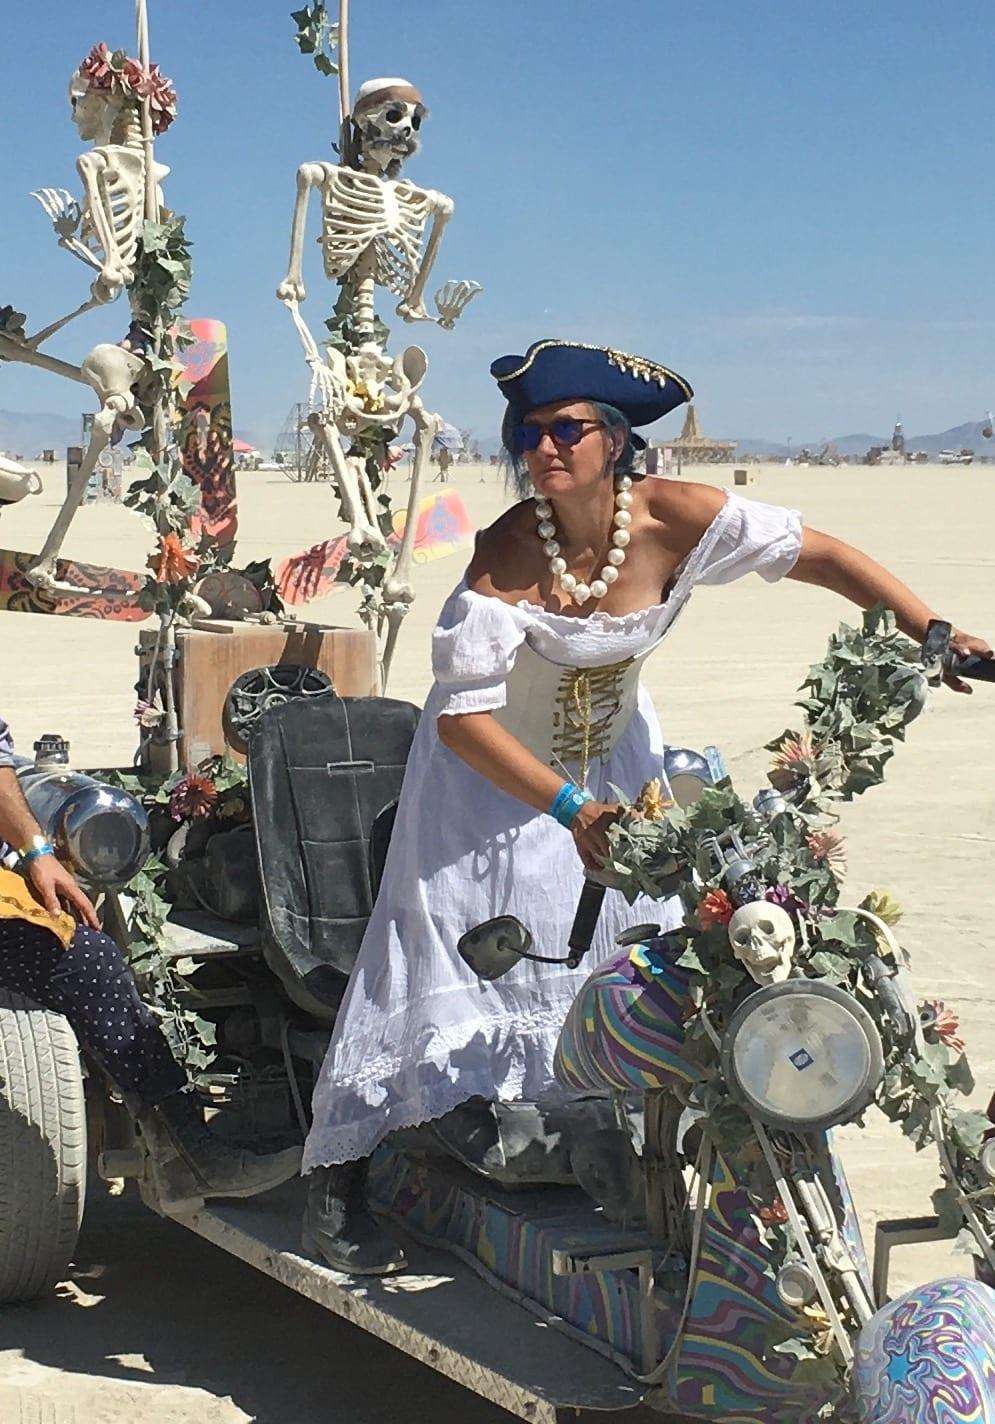 Stacey Newman Weldon of Adventure Wednesdays at Burning Man